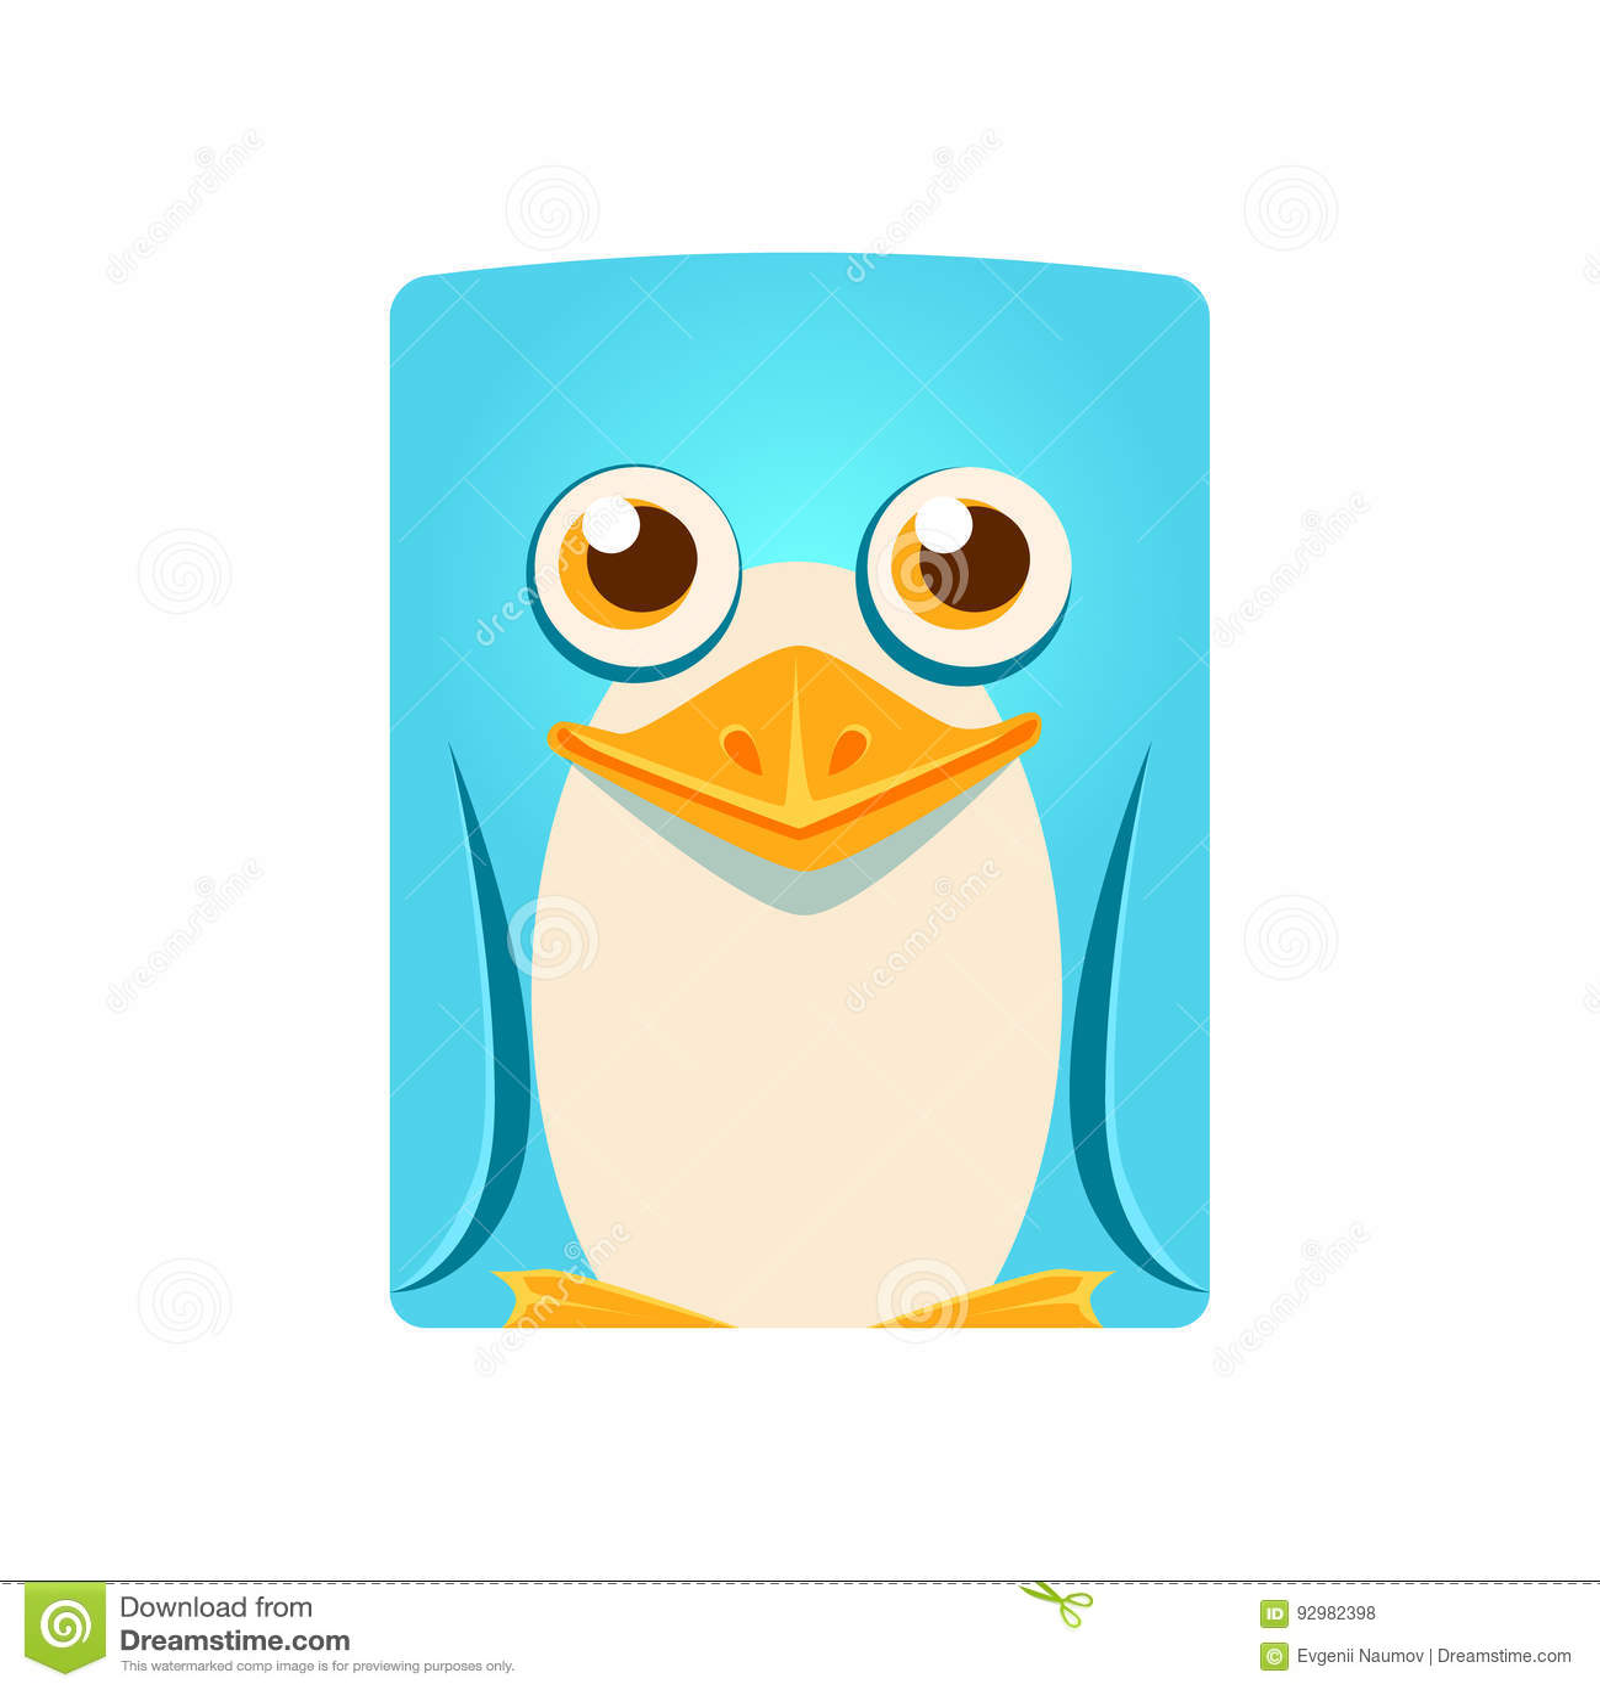 Vector Character Design Illustrator : Cute friendly geometric penguin bird colorful cartoon